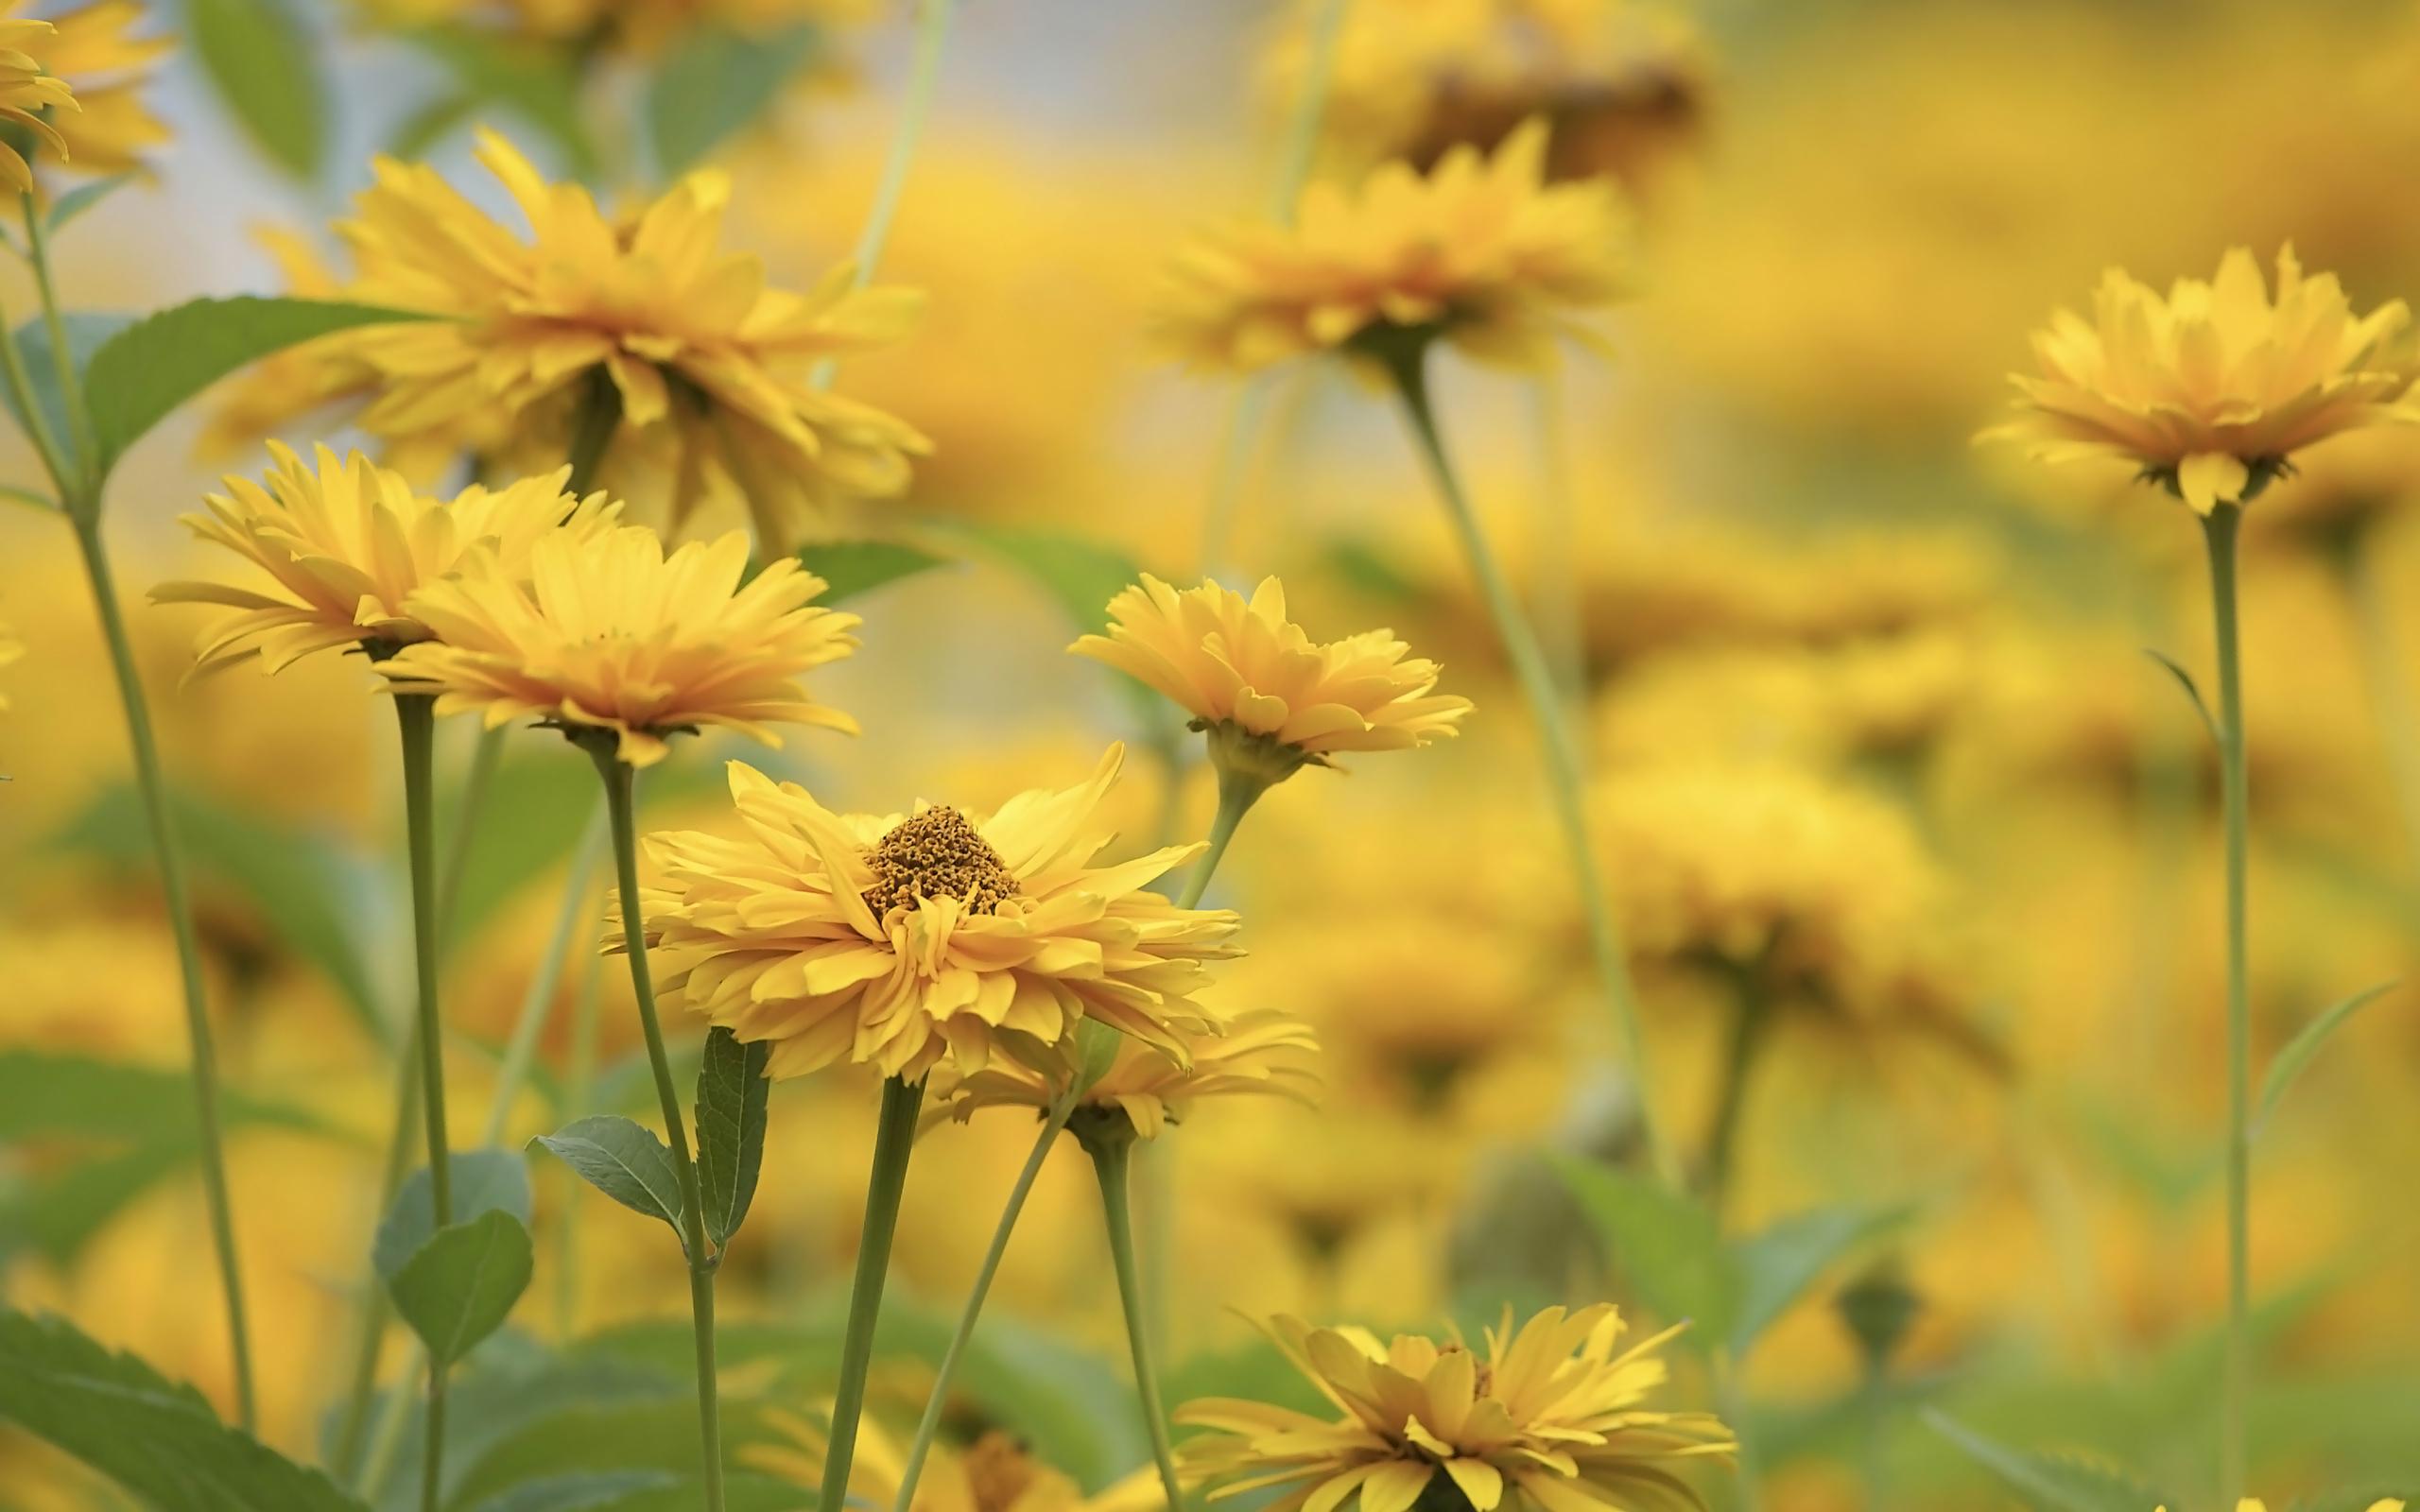 природа цветы желтый nature flowers yellow скачать